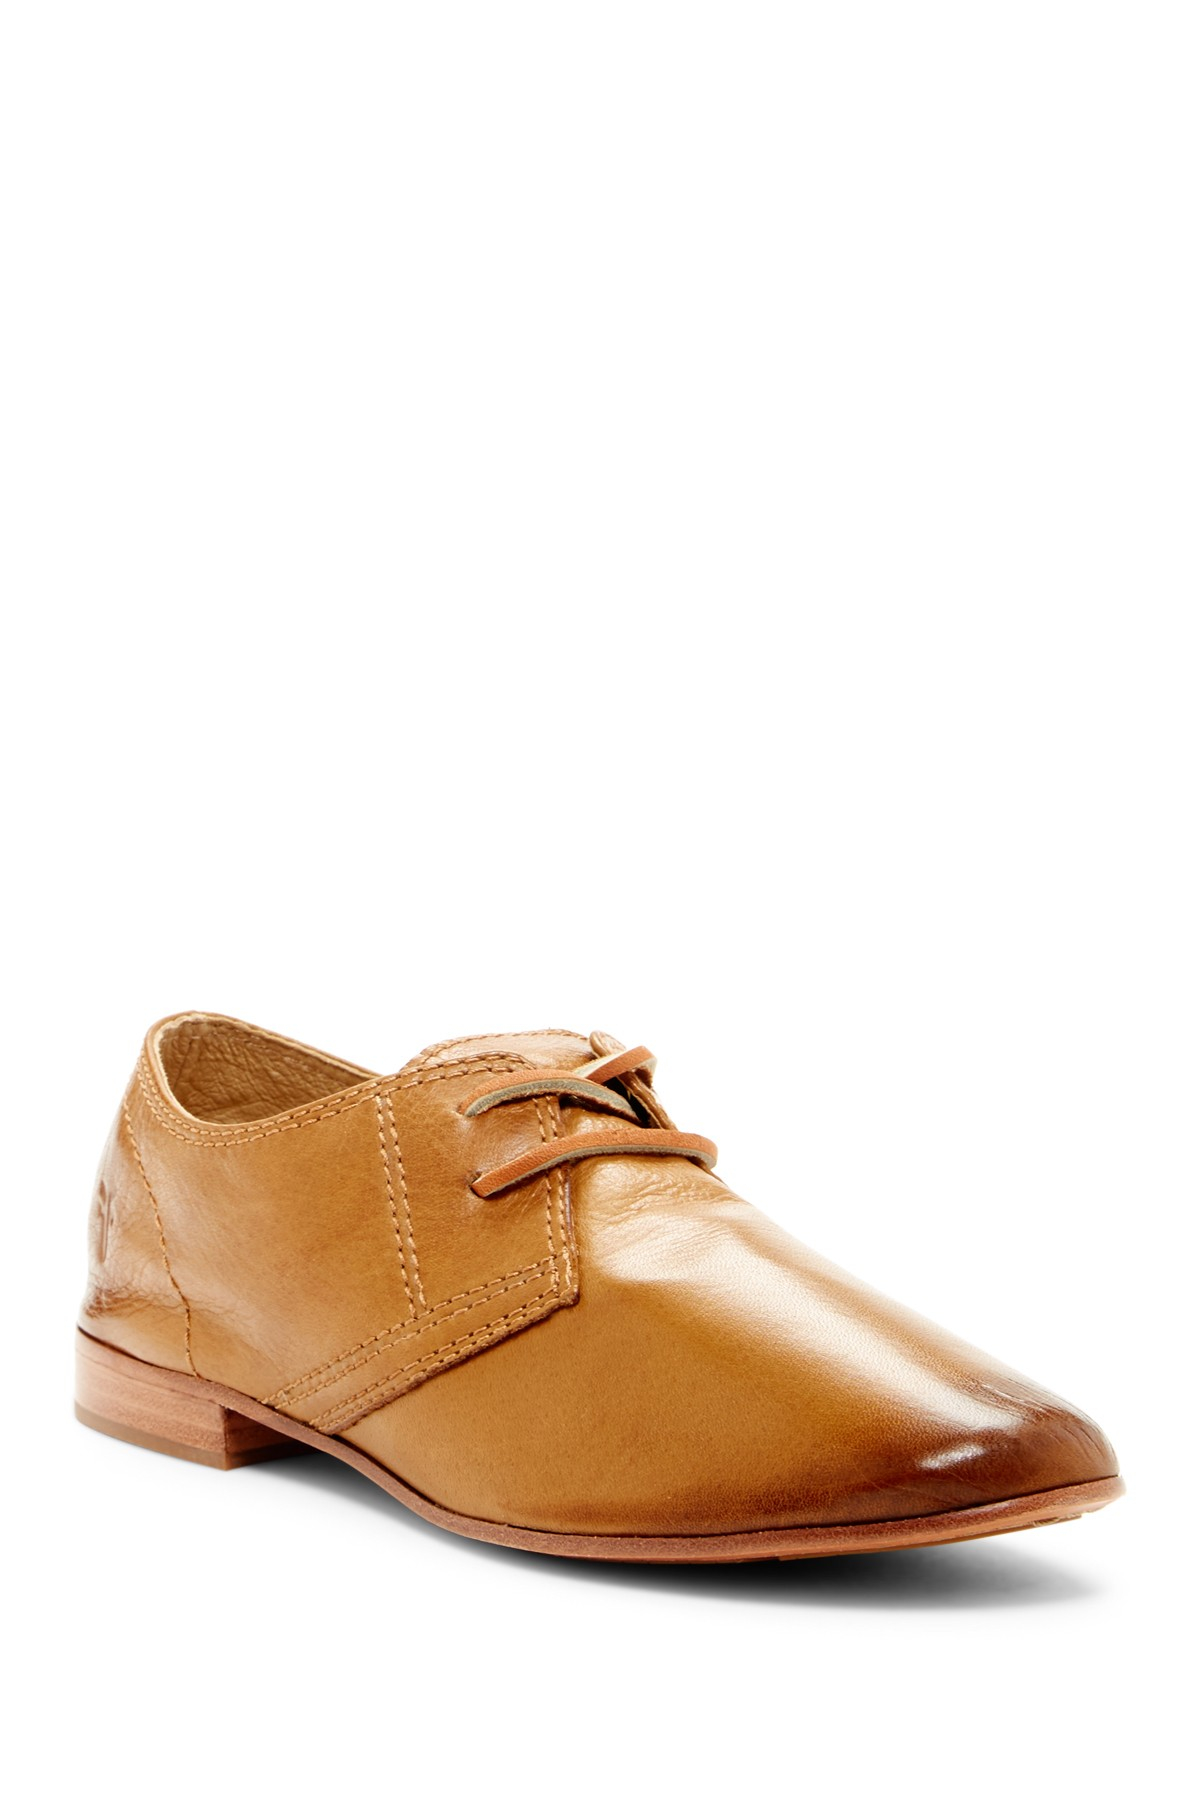 J Shoes Men S William Oxford